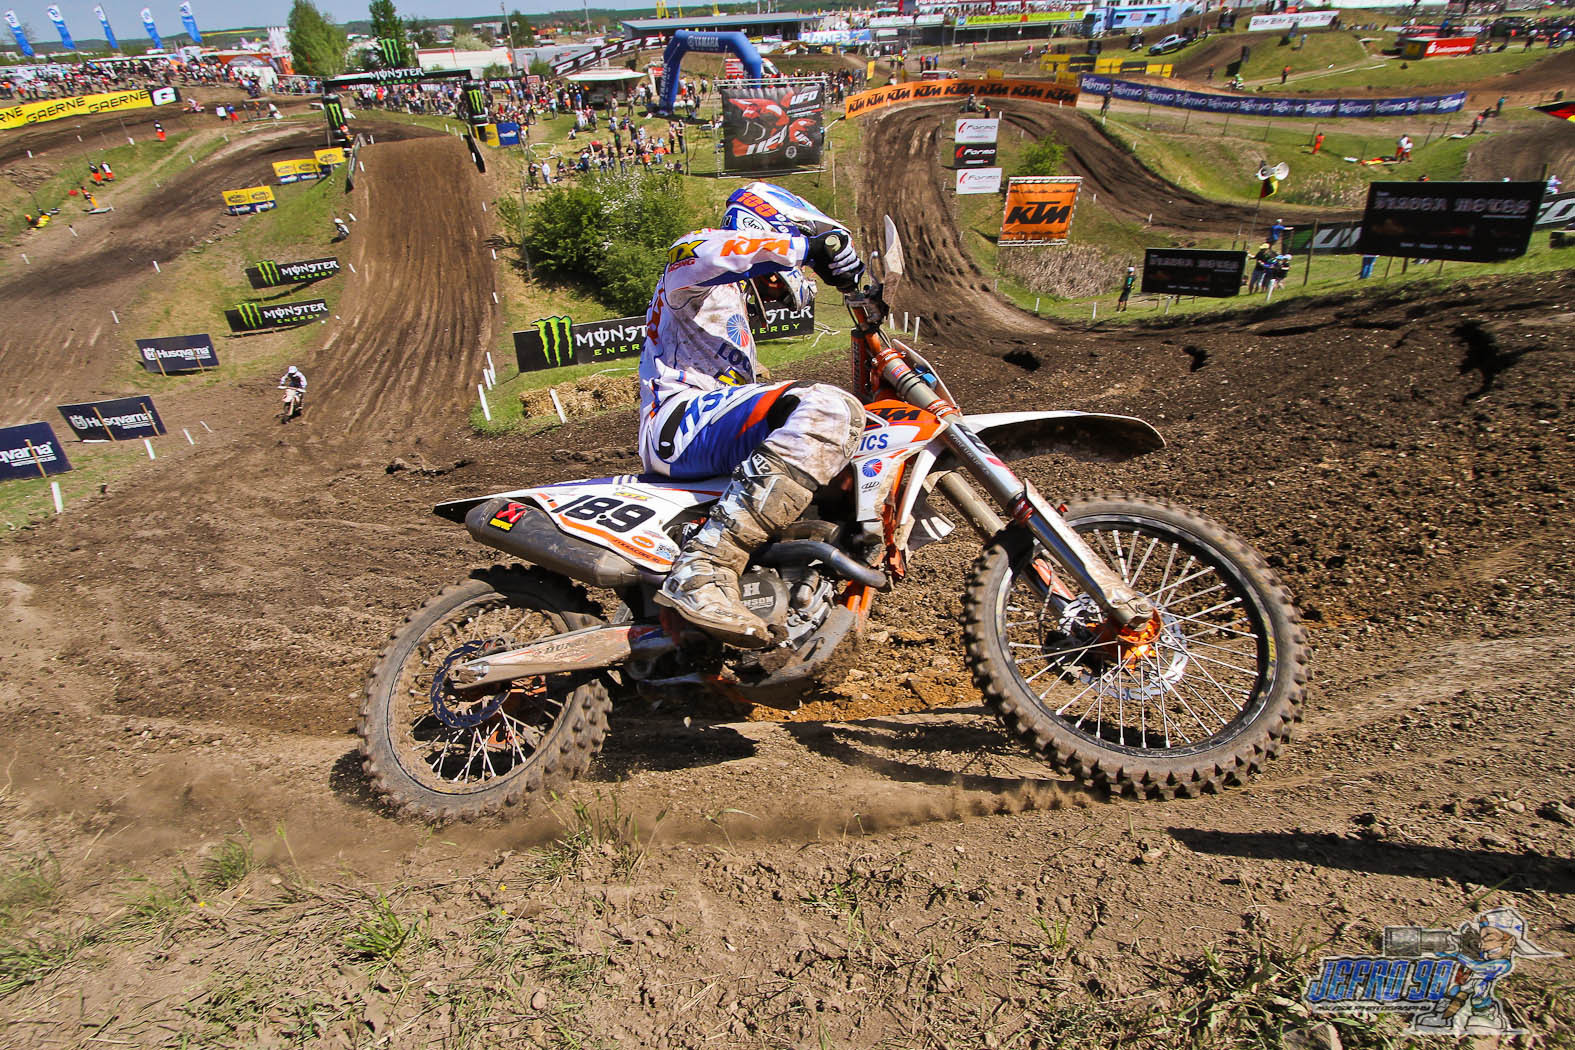 Brian Bogers - Photo Blast: MXGP of Germany - Motocross Pictures - Vital MX